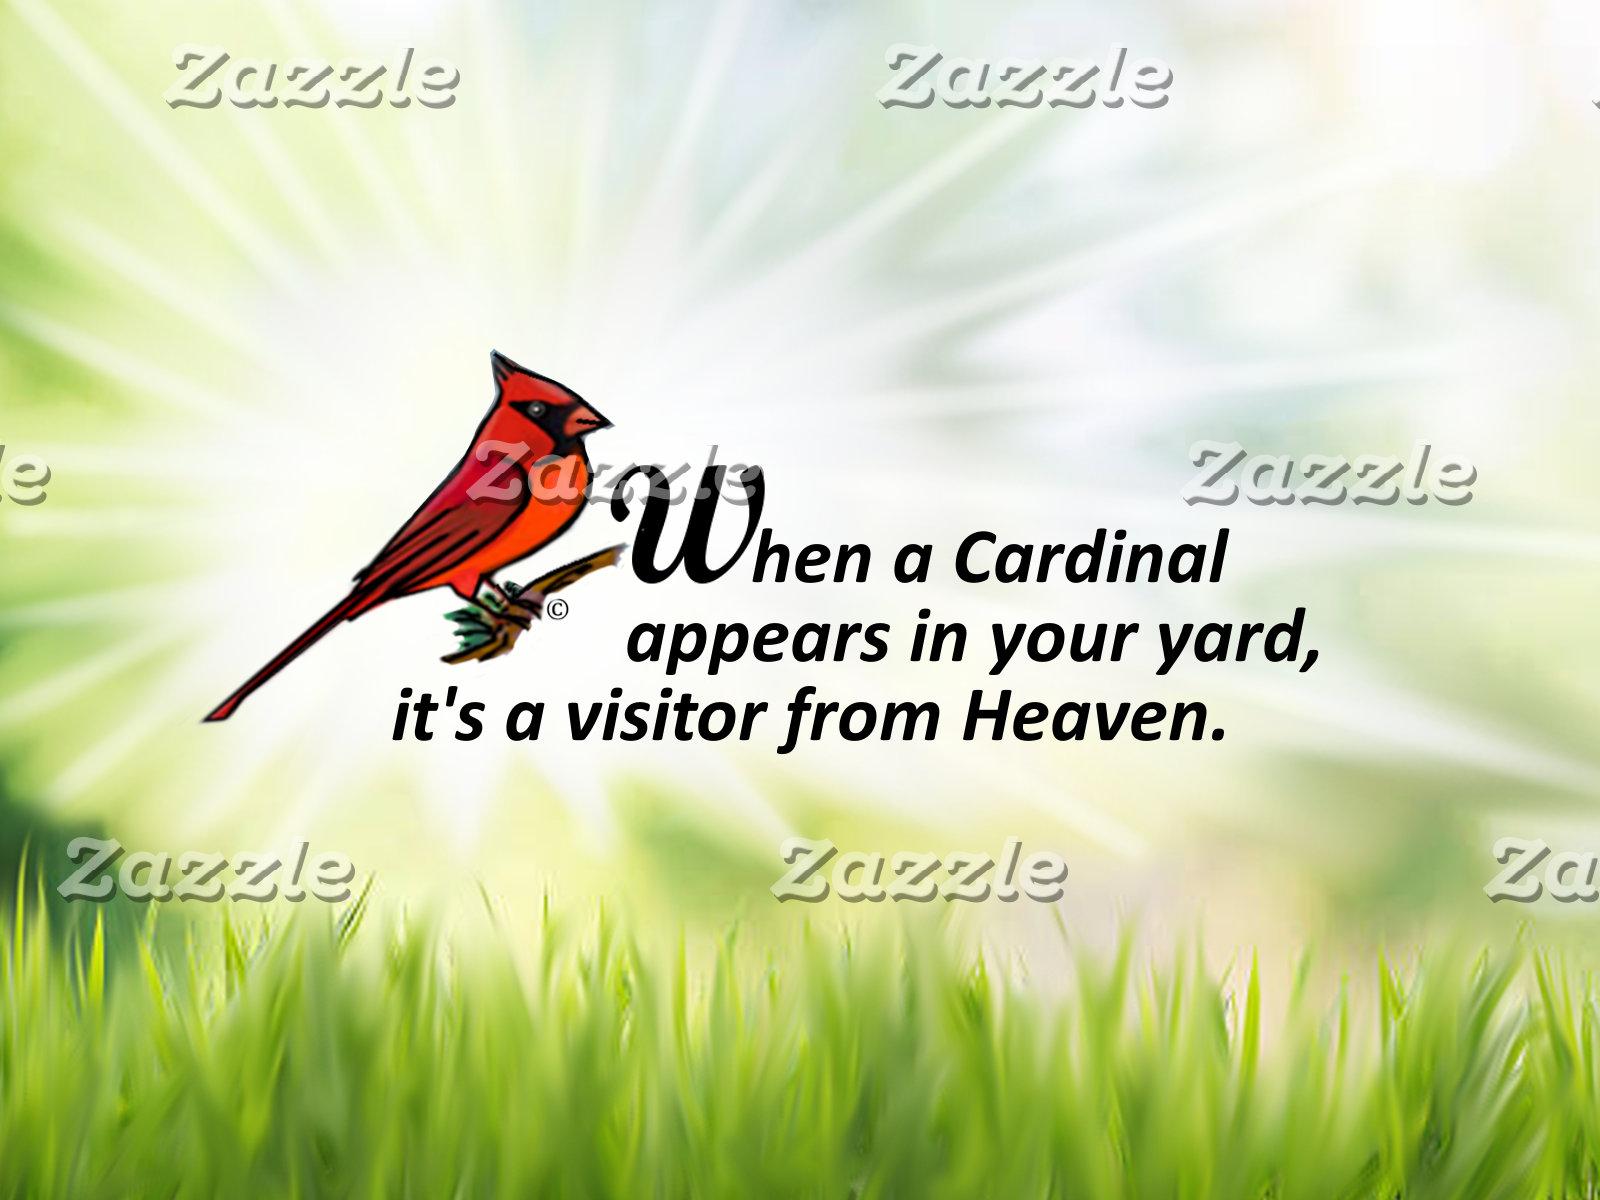 Cardinal in Your Yard